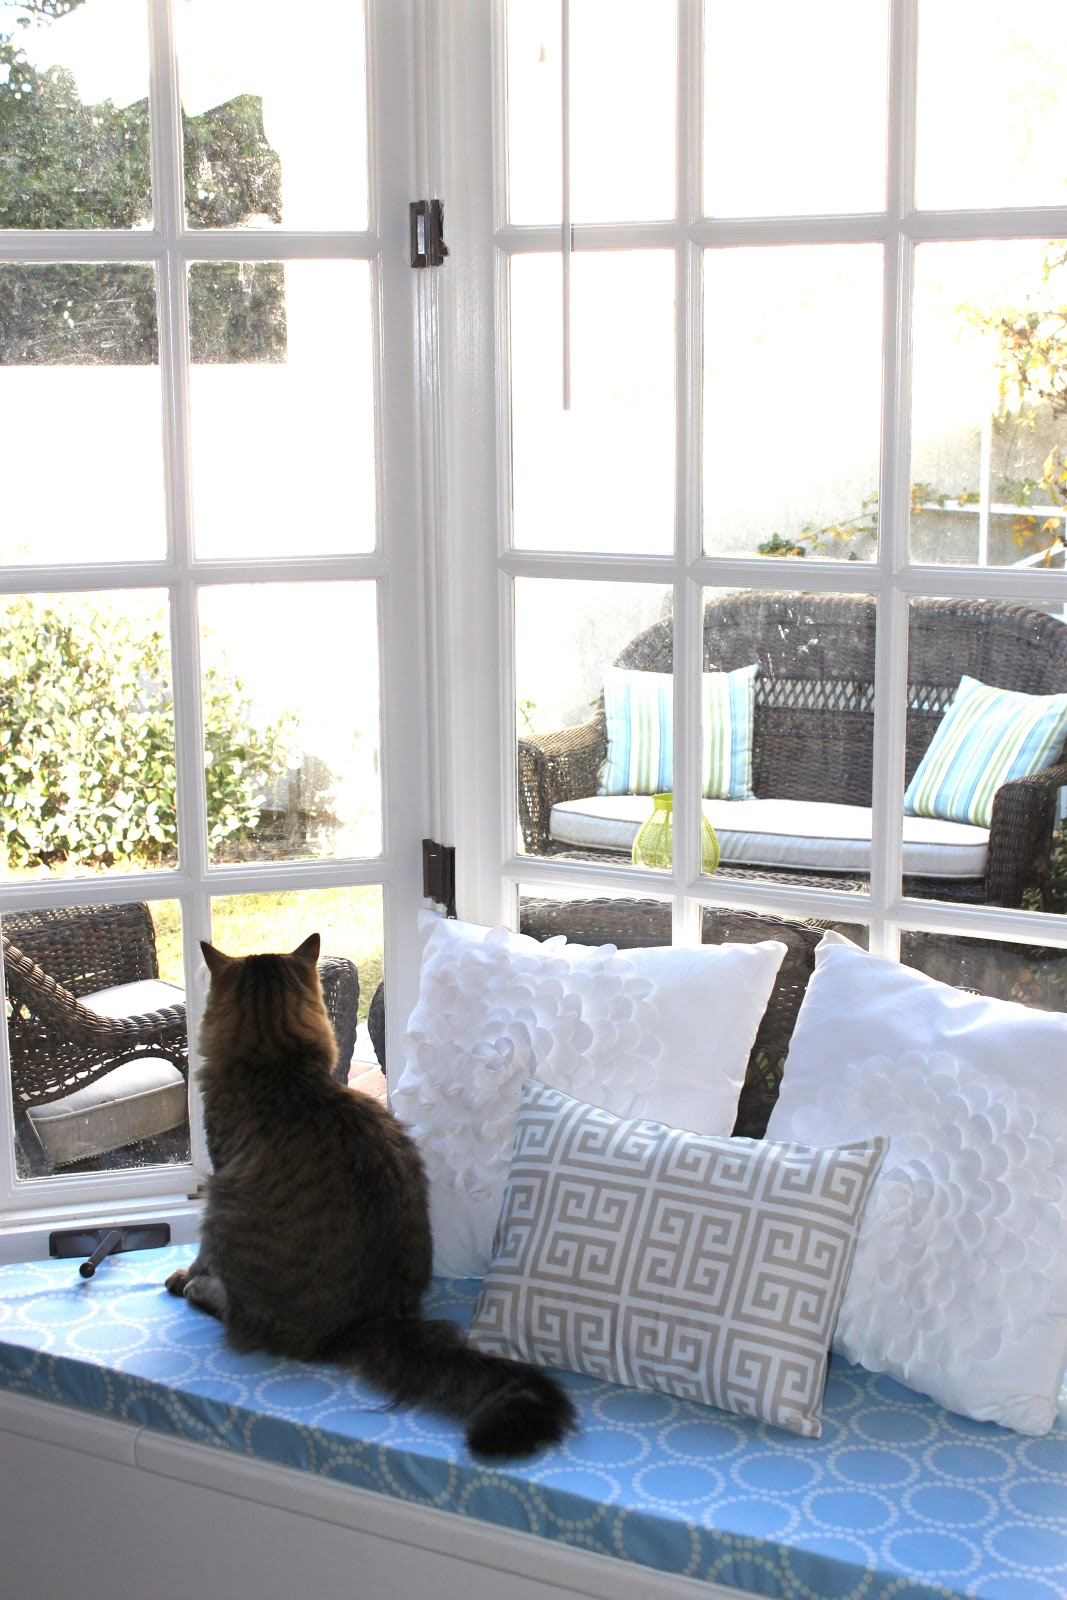 How to make bay window cushions - How To Make Bay Window Cushions 49